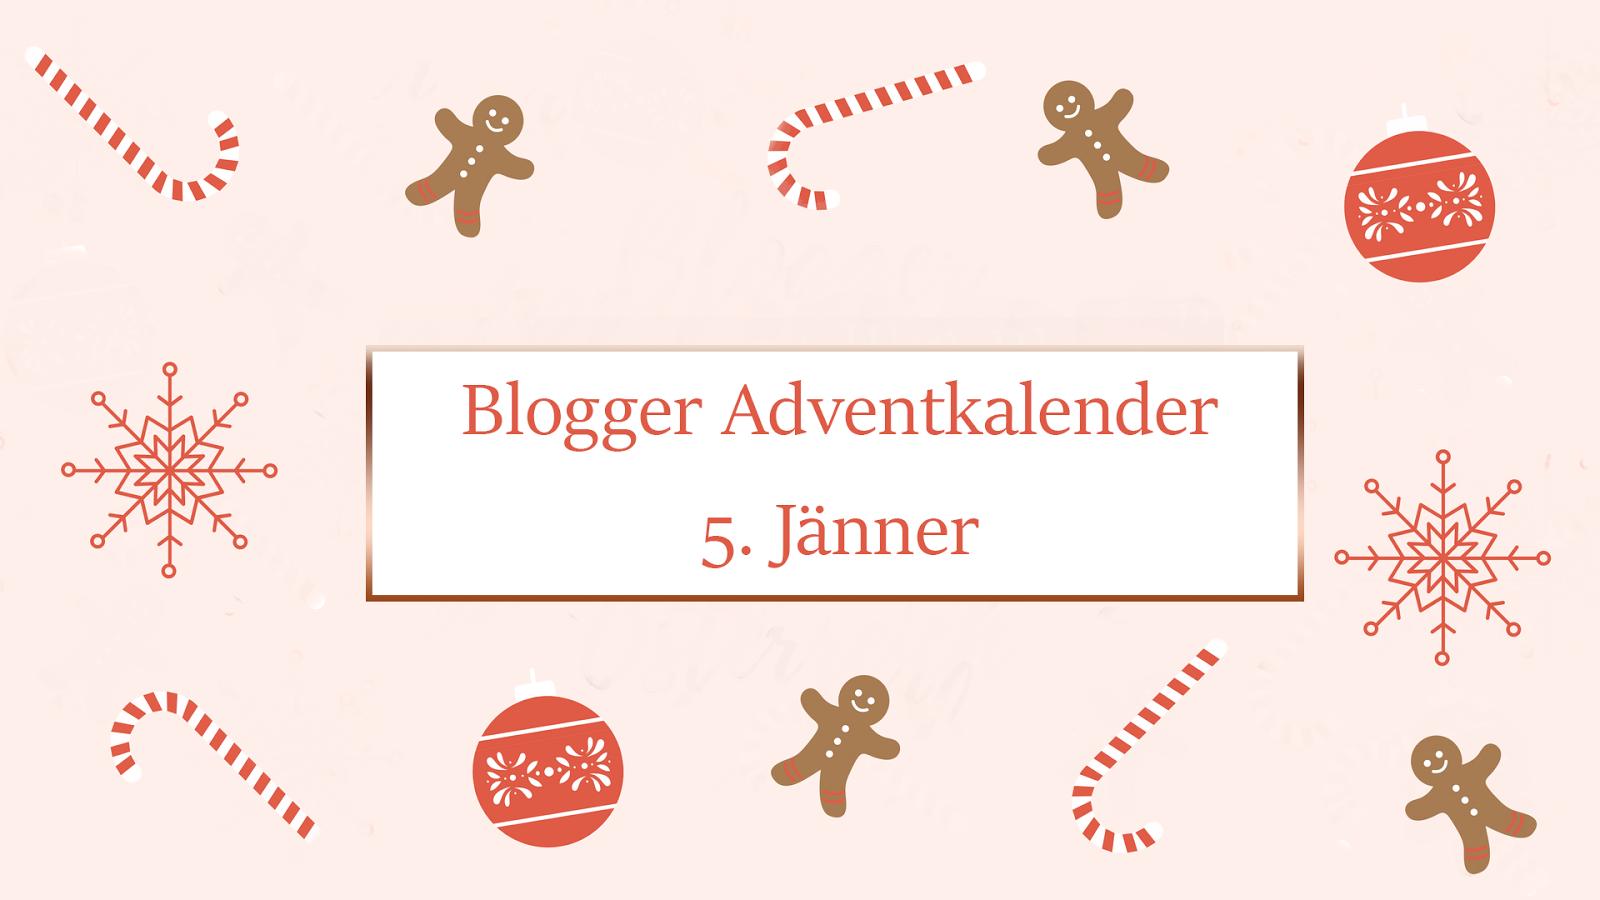 Blogger Adventkalender Gewinnspiel 2017